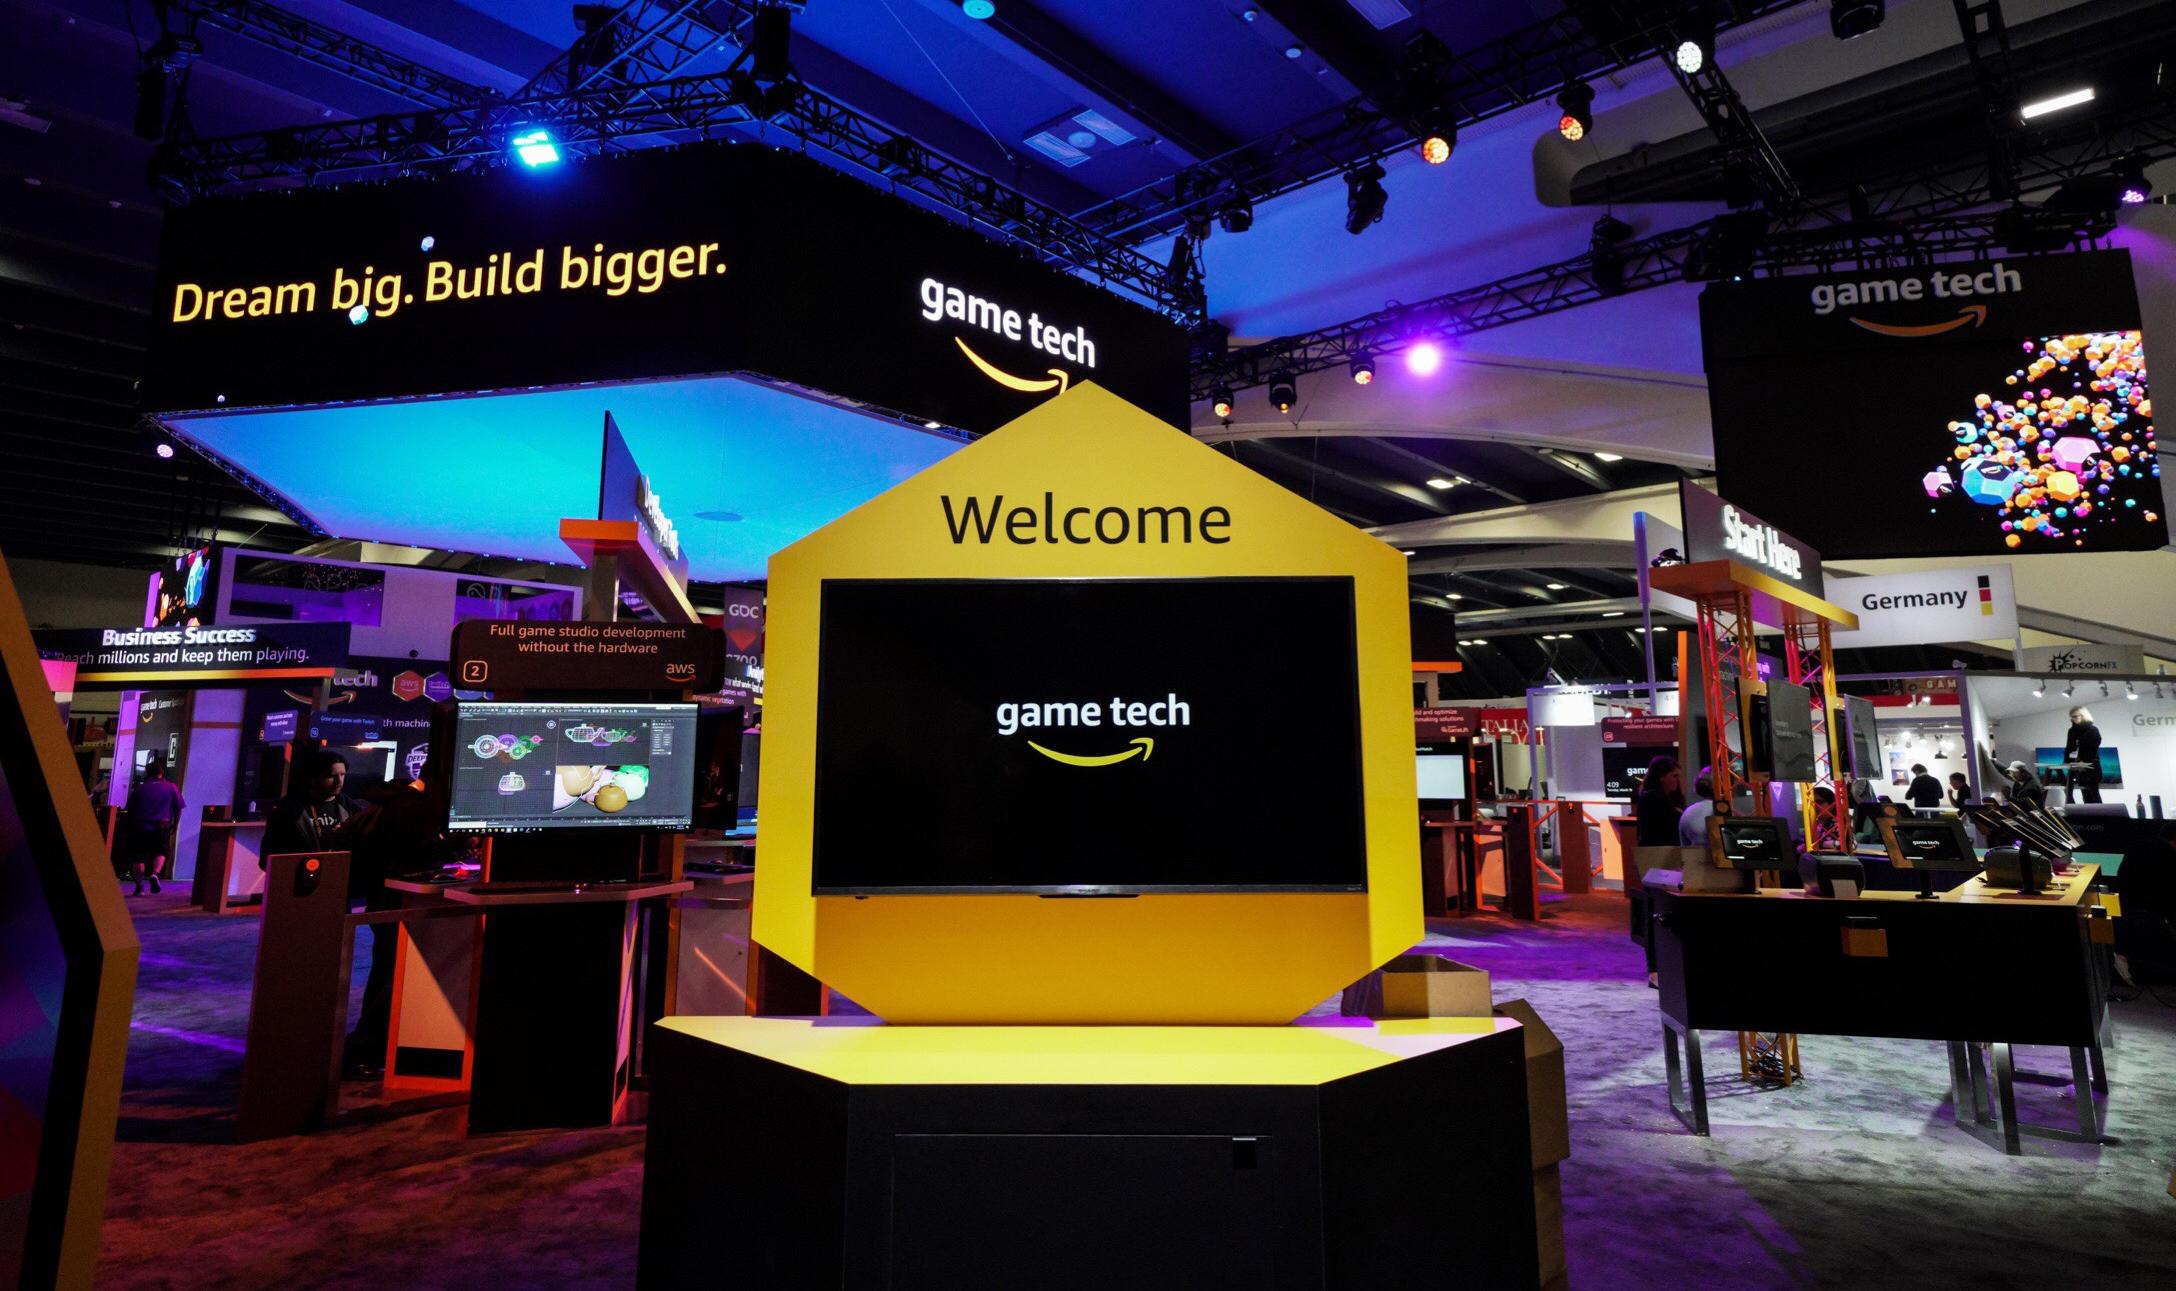 Amazon Game Tech